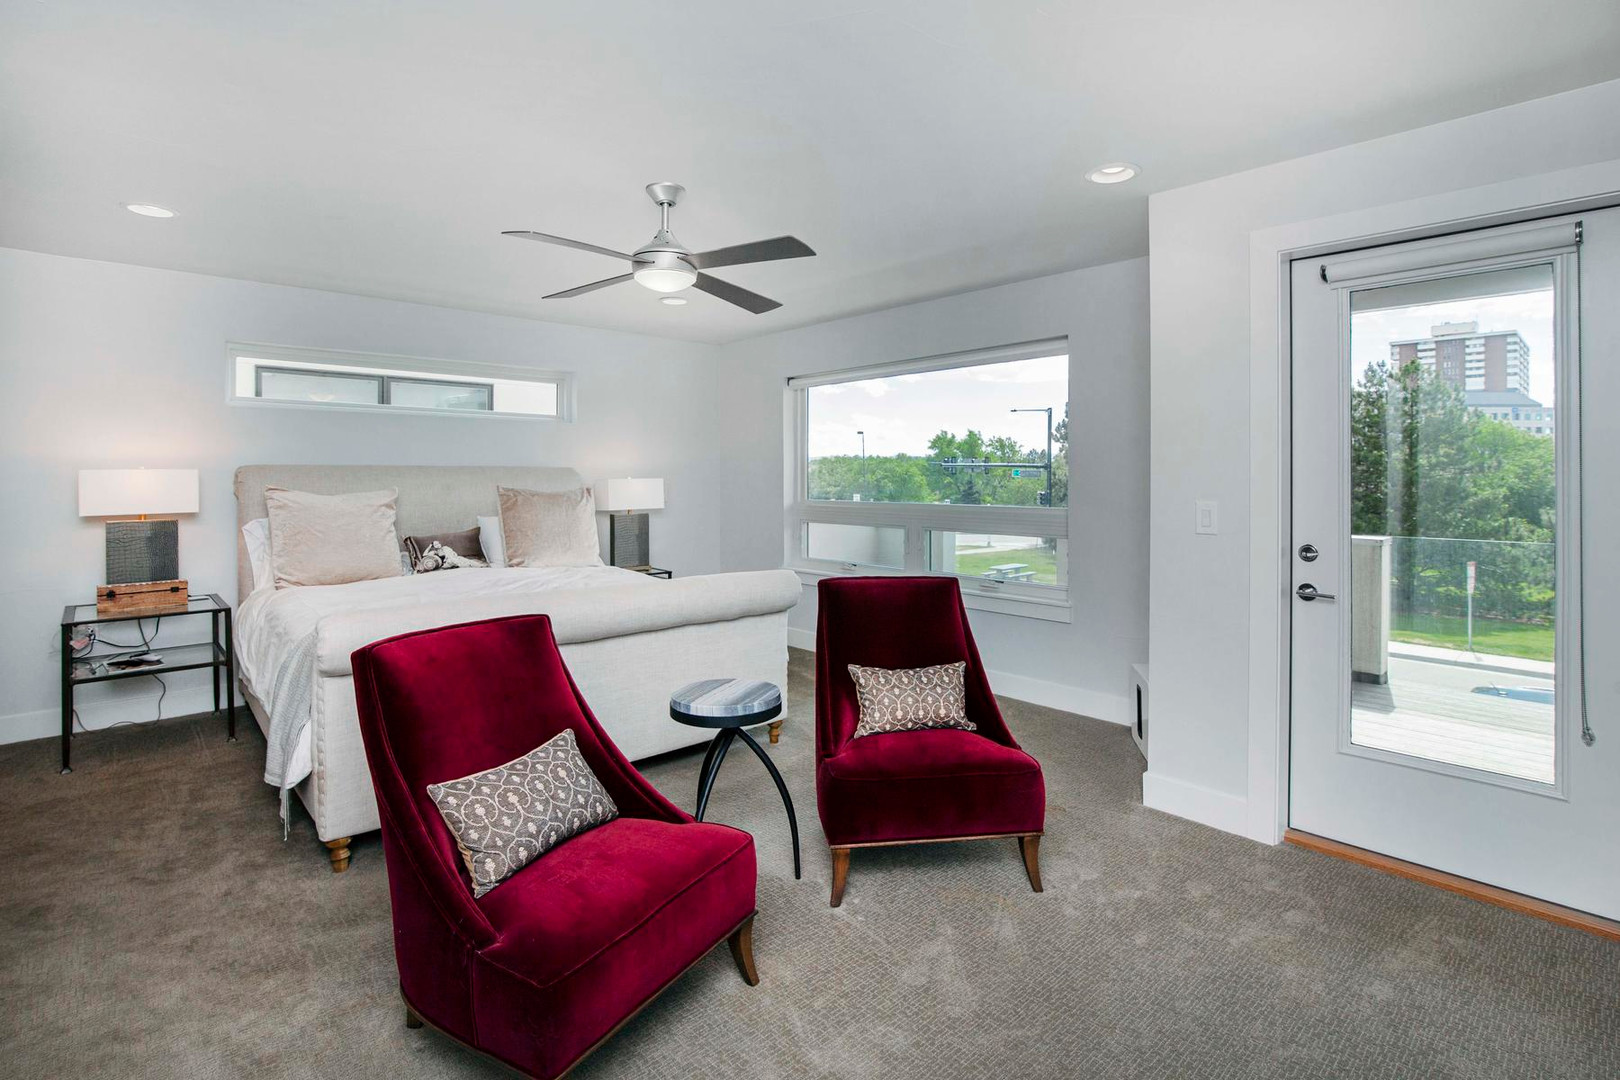 260 S Madison Street-026-031-Bedroom-MLS